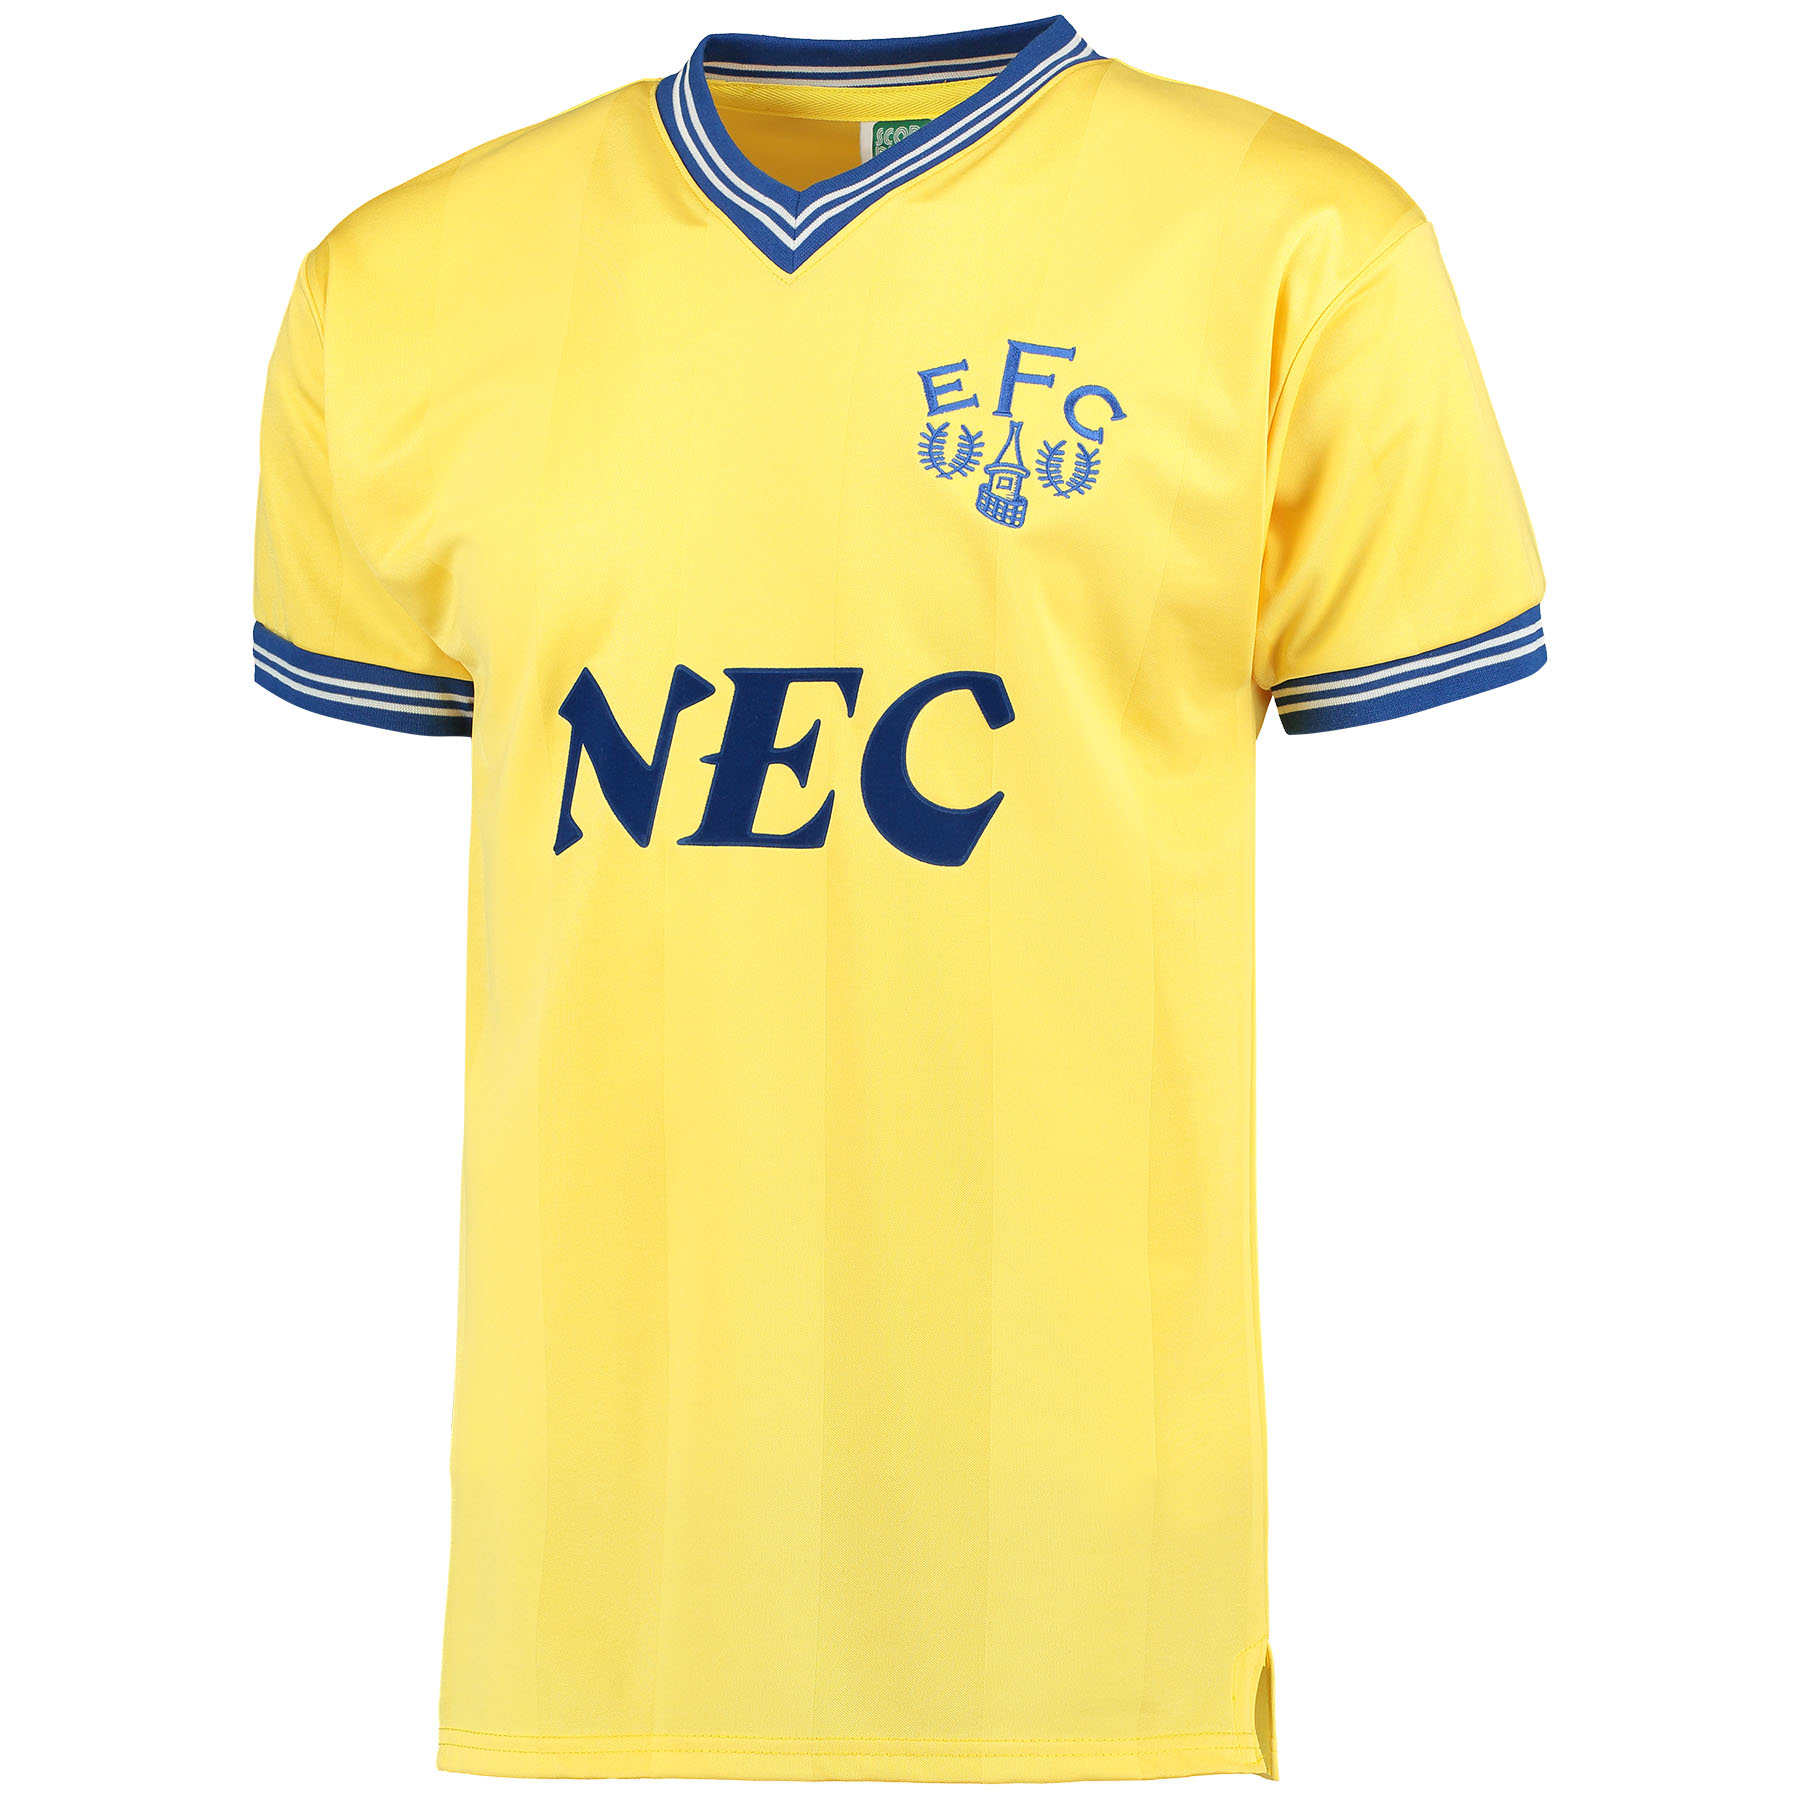 Everton 1986 Away Shirt - Yellow